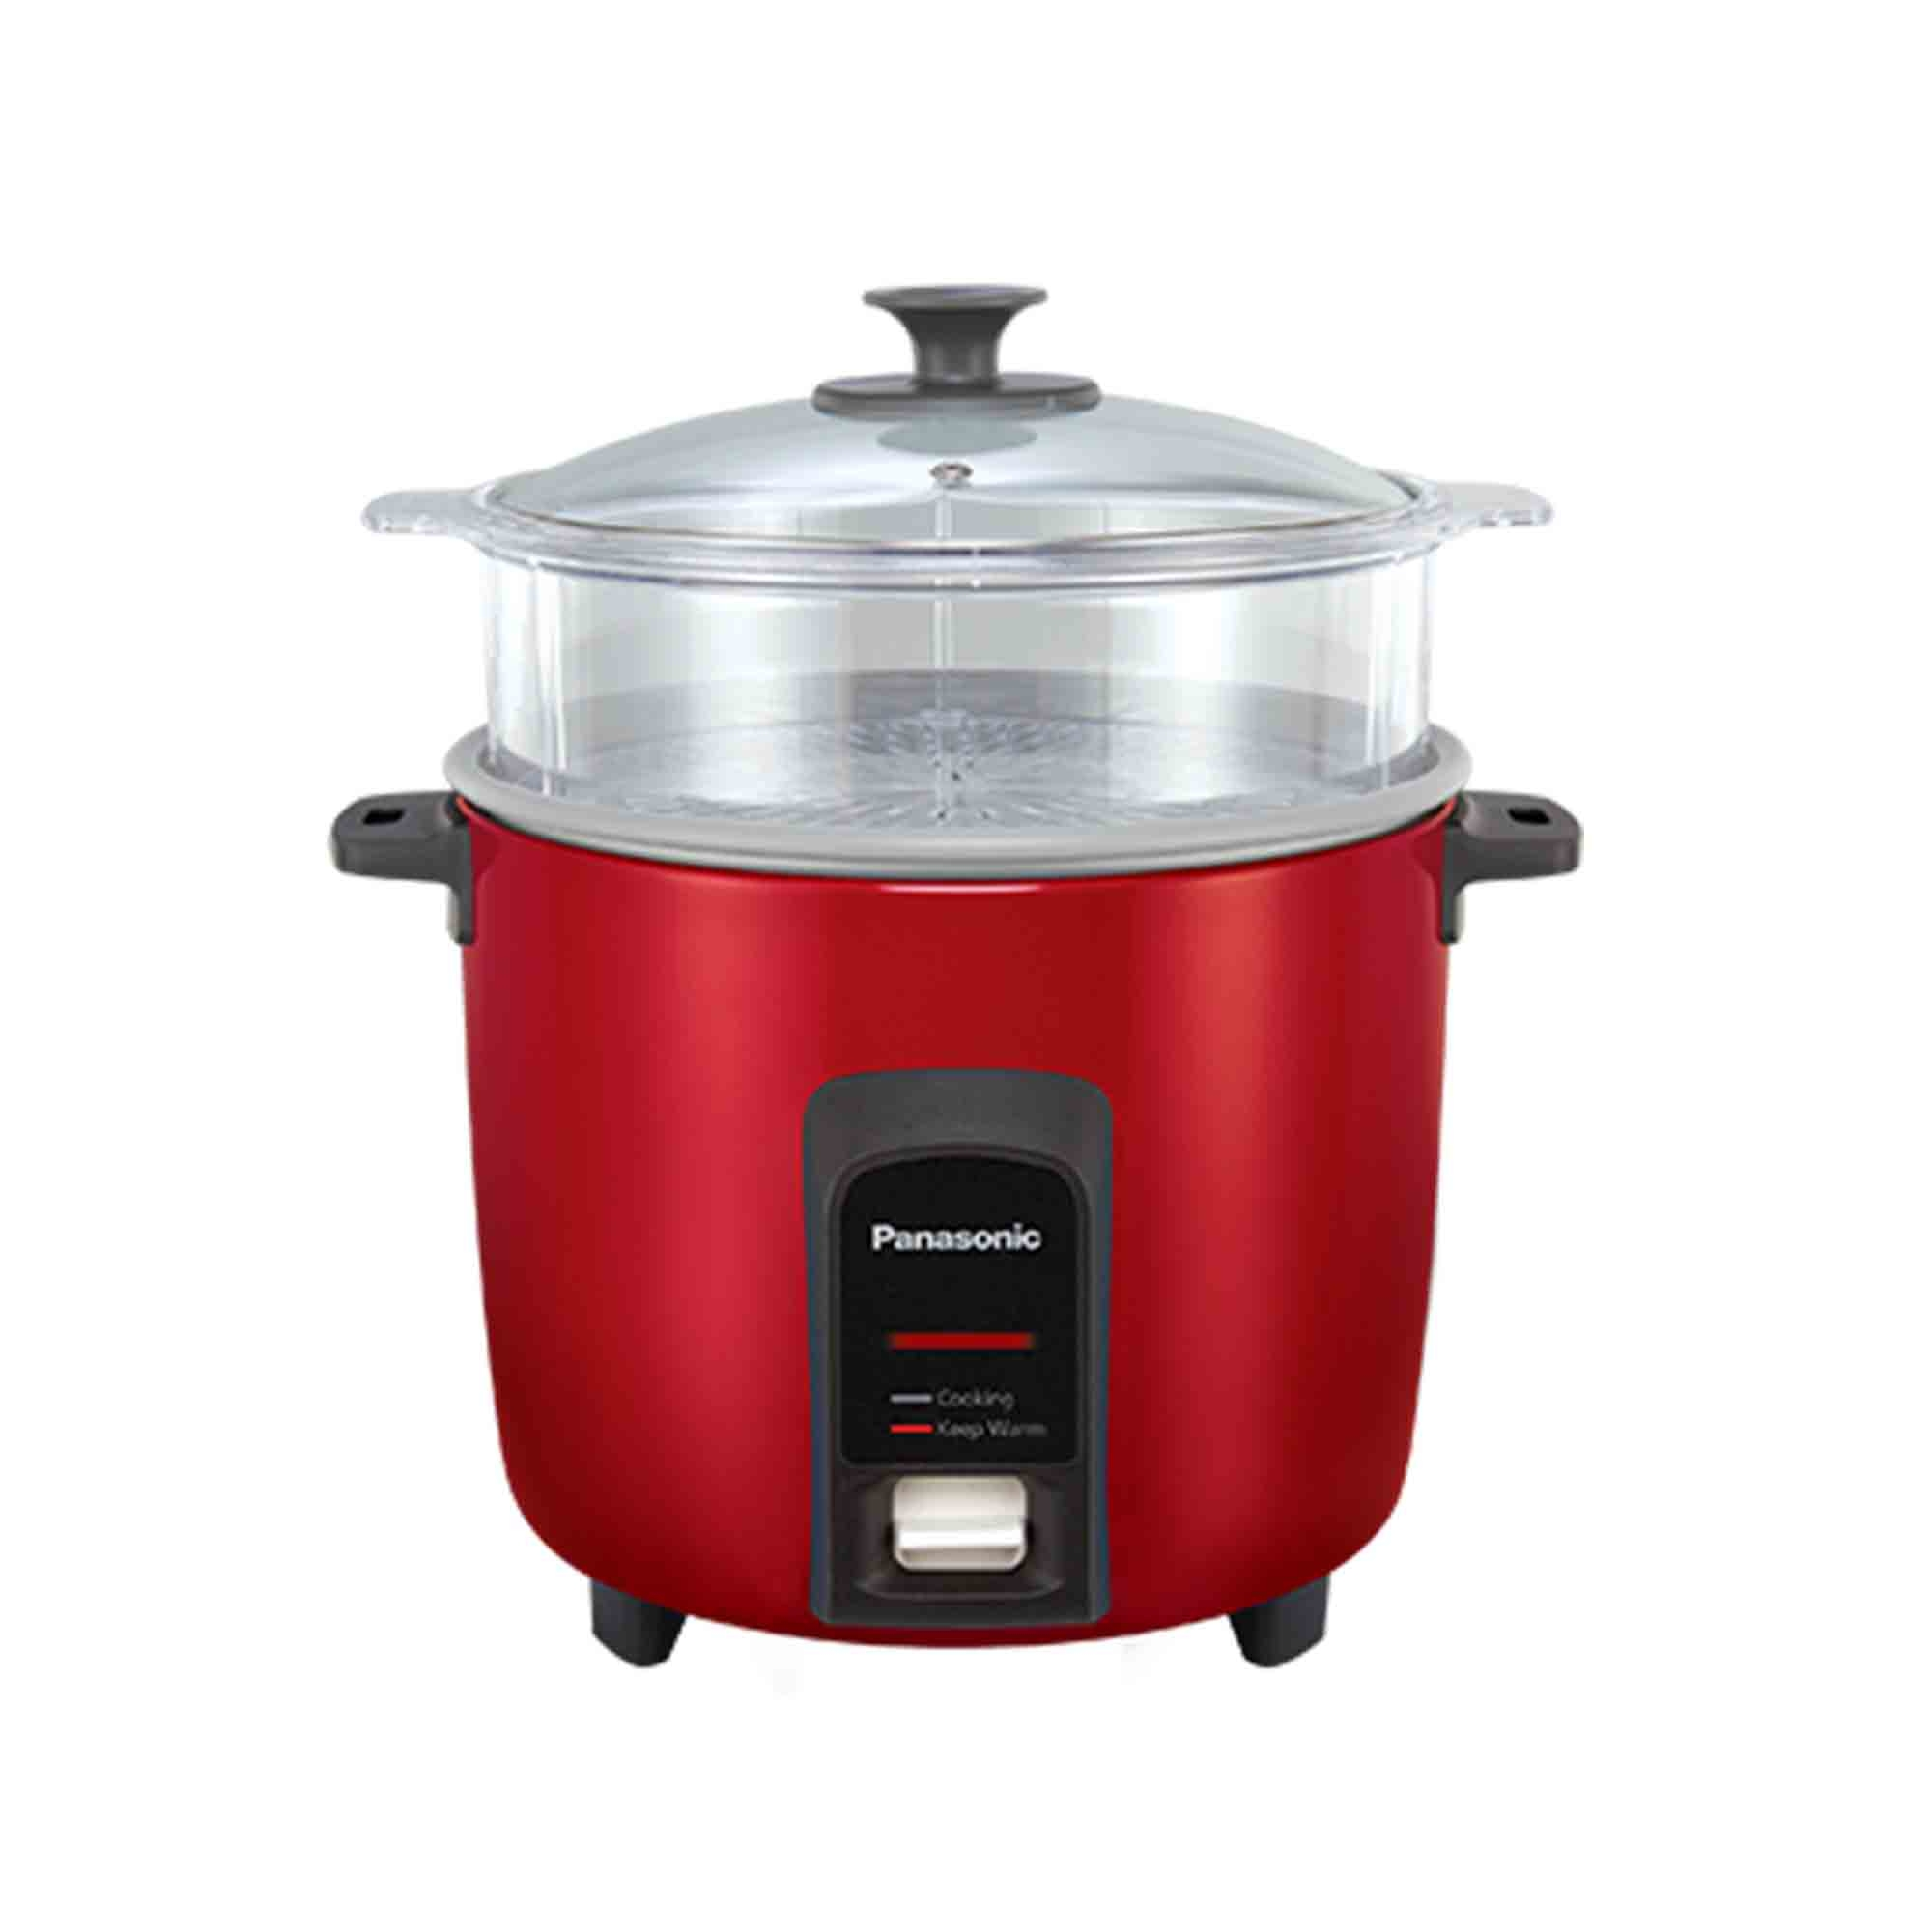 panasonic steam rice cooker sr y22fgj end 5 2 2020 8 16 pm rh lelong com my Panasonic DMR ES40V Manual Panasonic.comsupportbycncompass